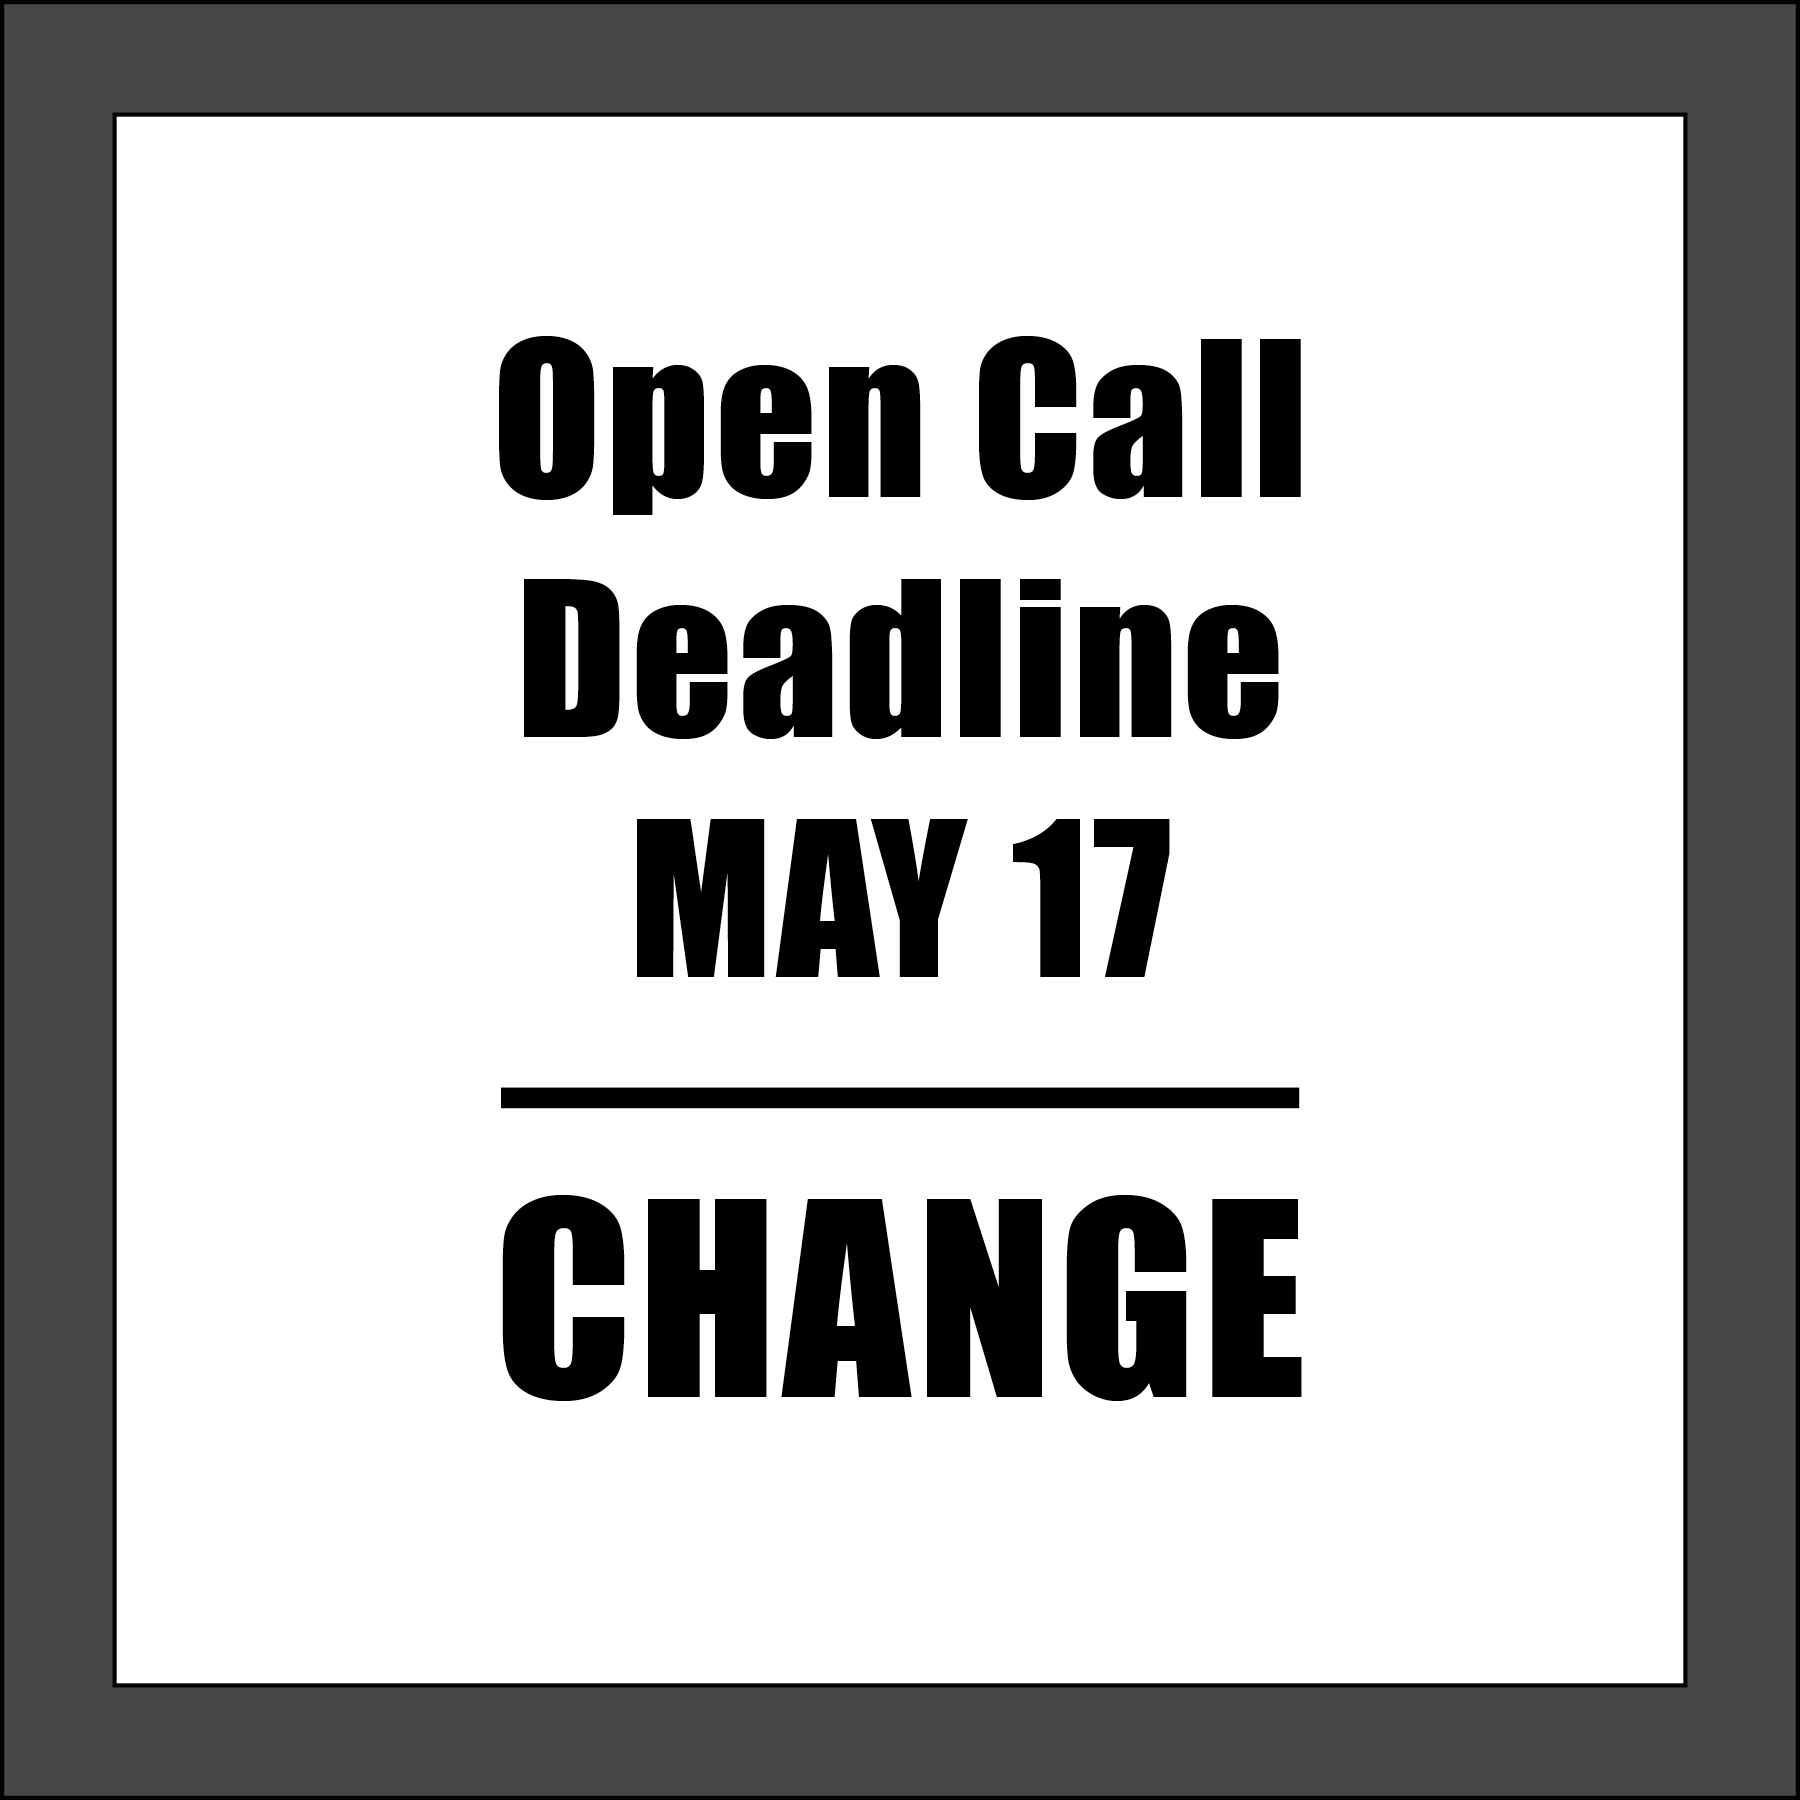 Open Call Image 2.jpg